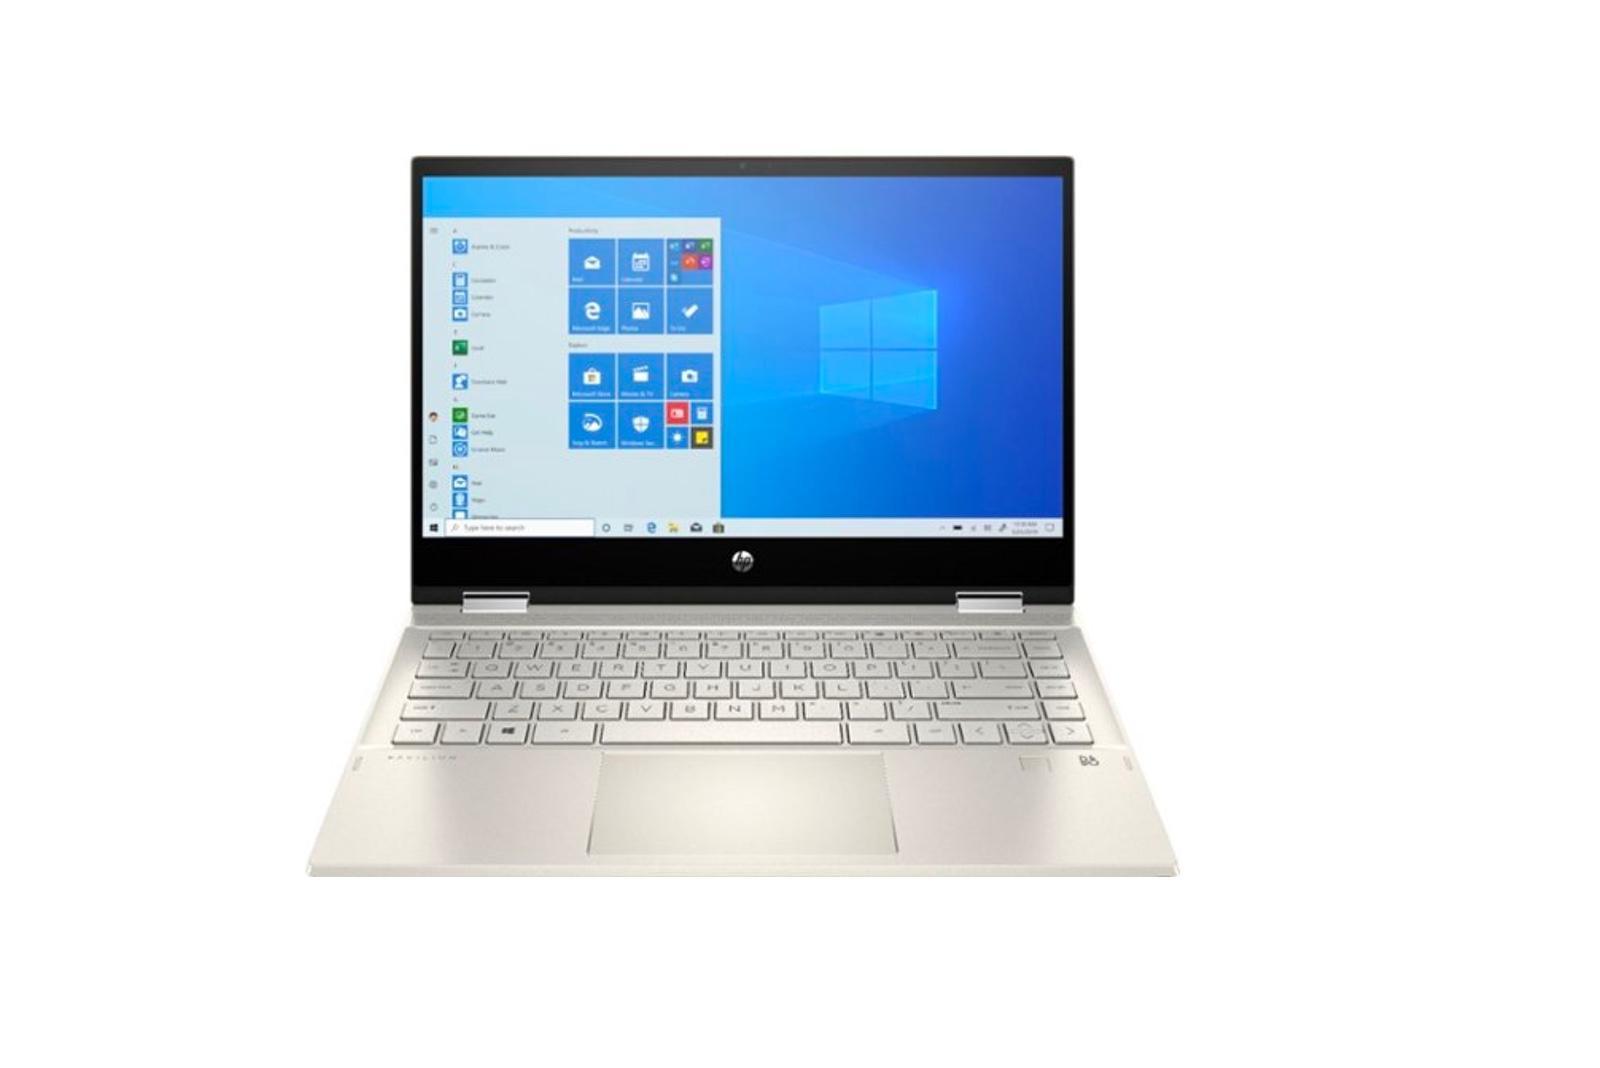 Cyber Week Laptop Deals Surface Pro 7 Razer Blade More Update Expired Zdnet